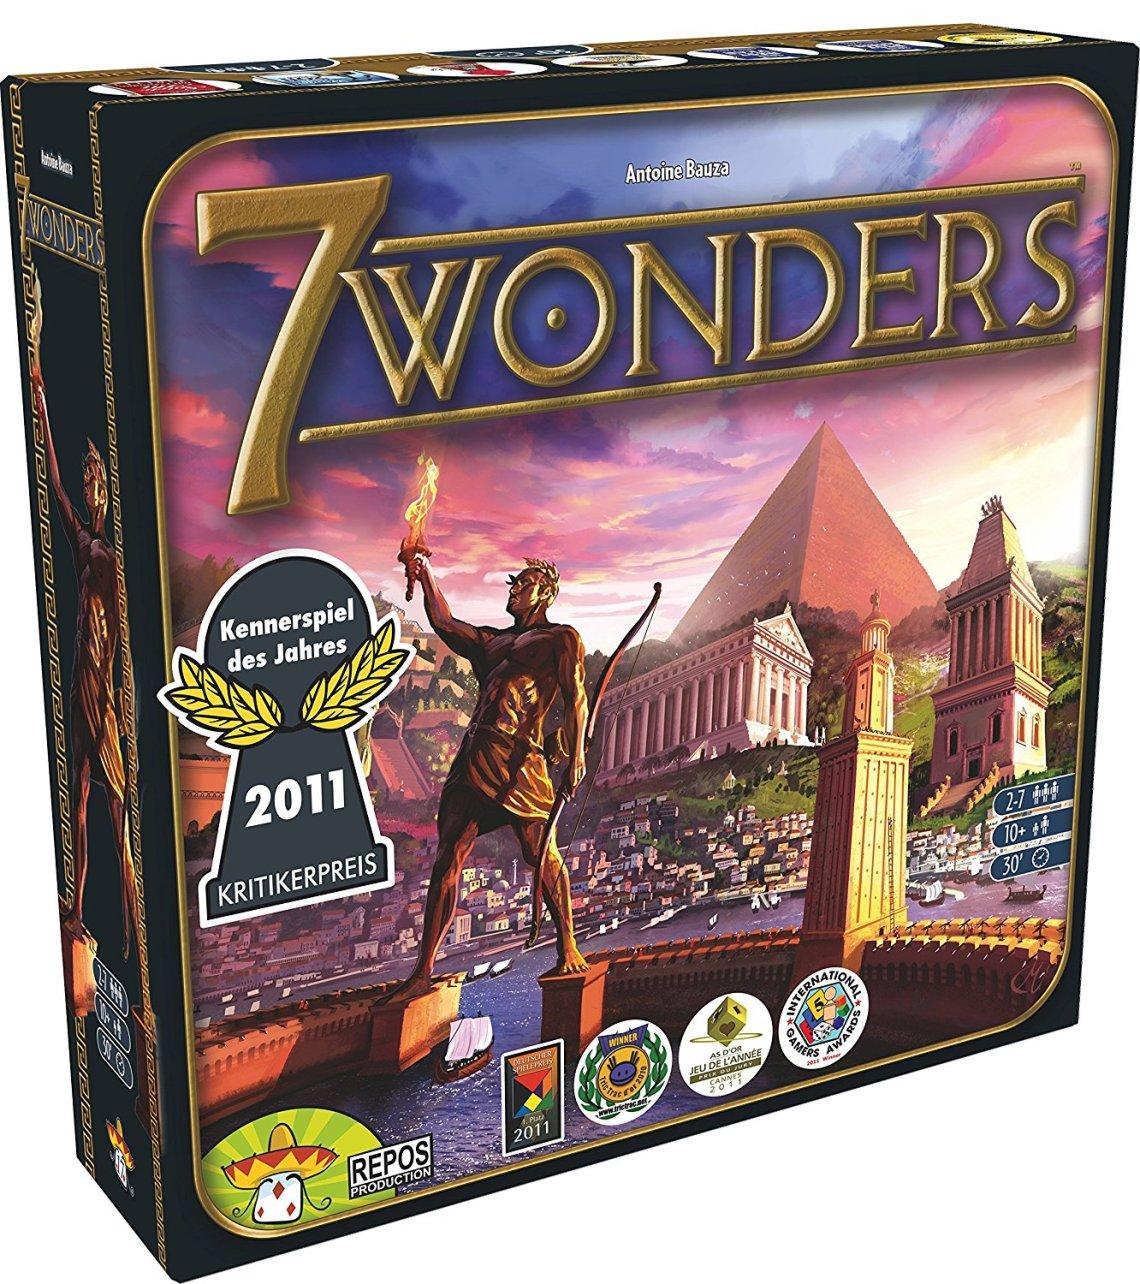 Games, Toys & more Familienspiele Linz 7 Wonders